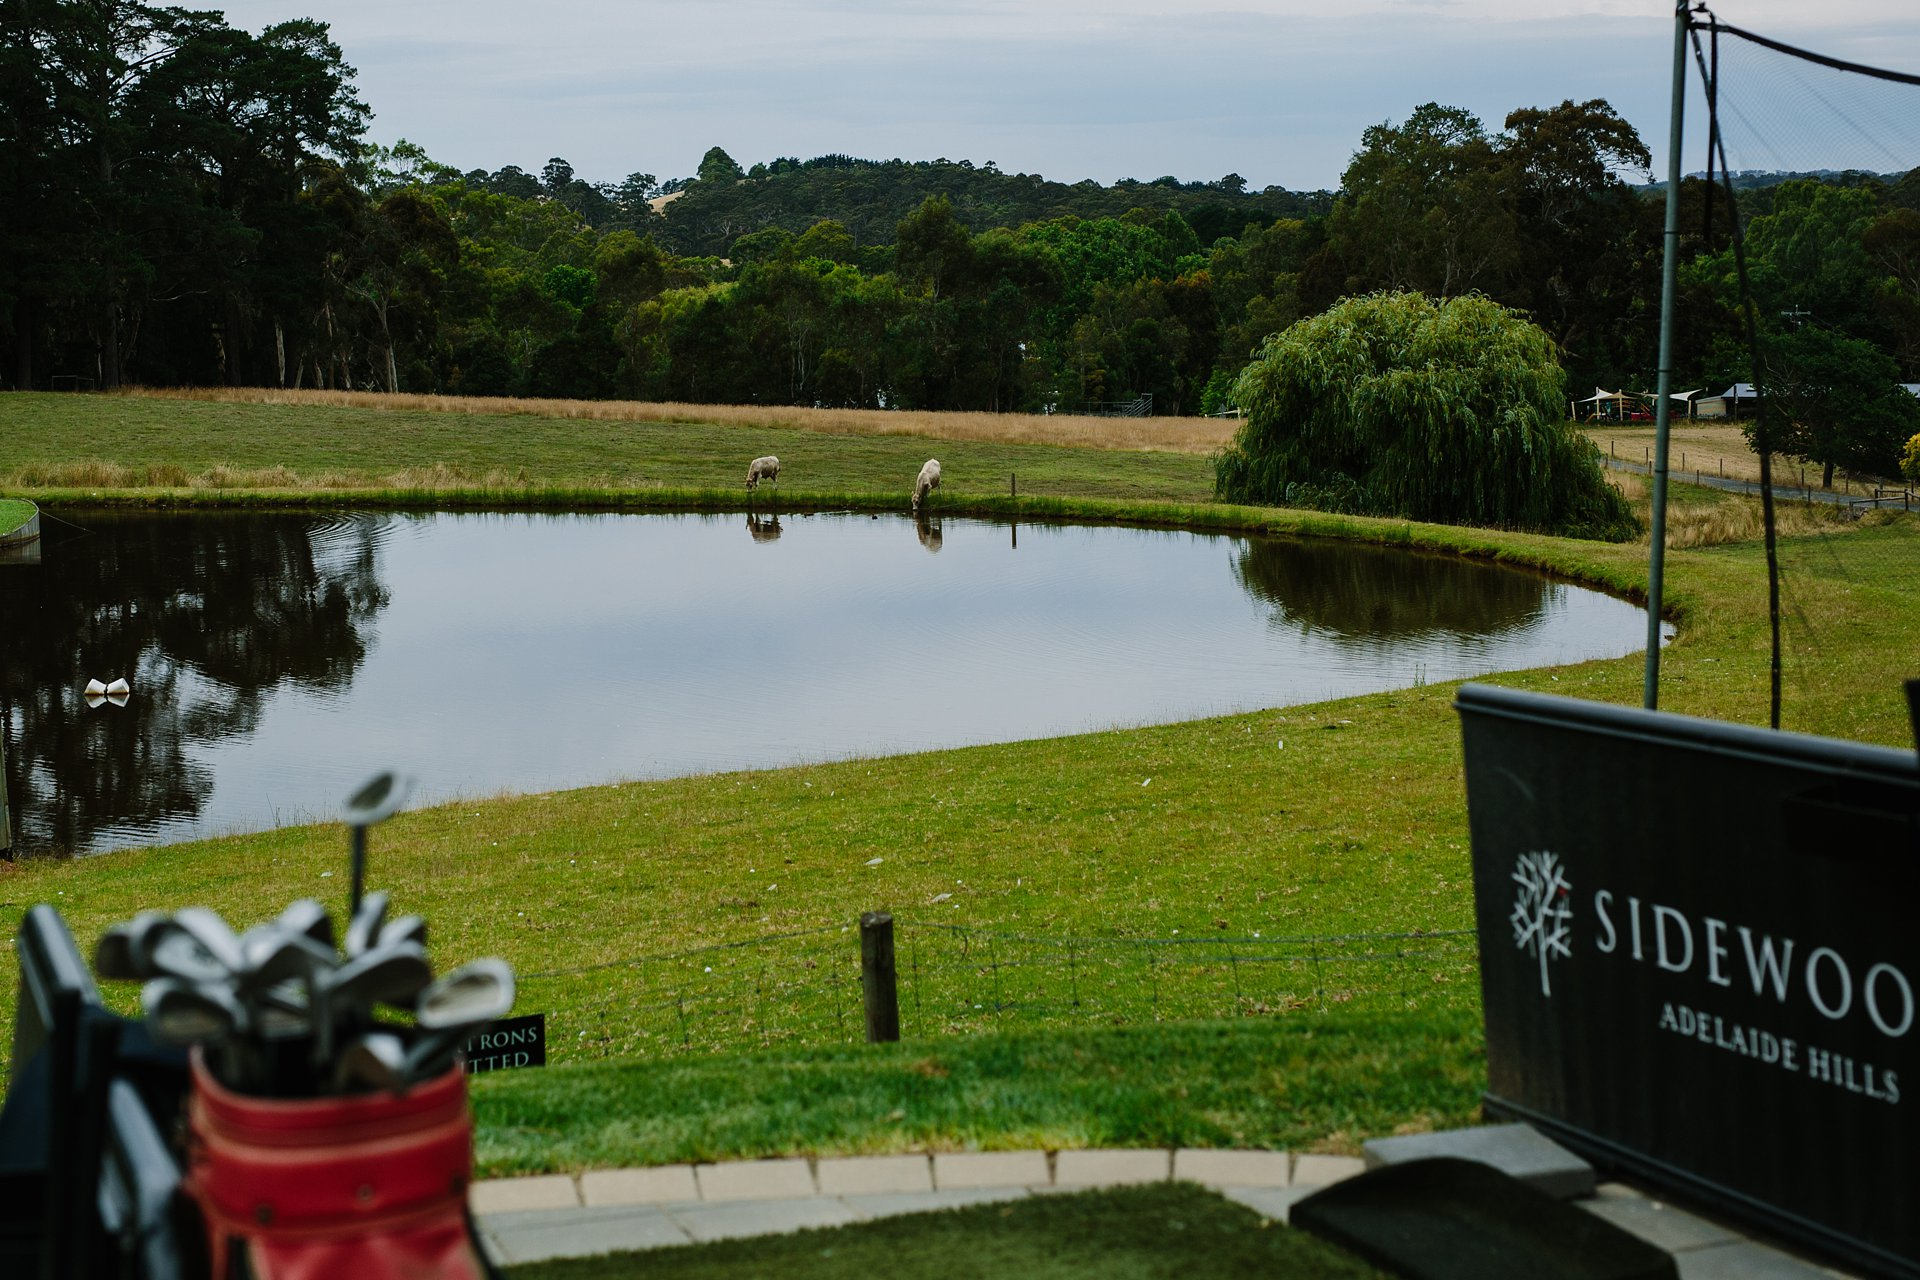 Maximilians-Restaurant-Adelaide-Hills-South-Australia-Side-Wood-Estate_0895